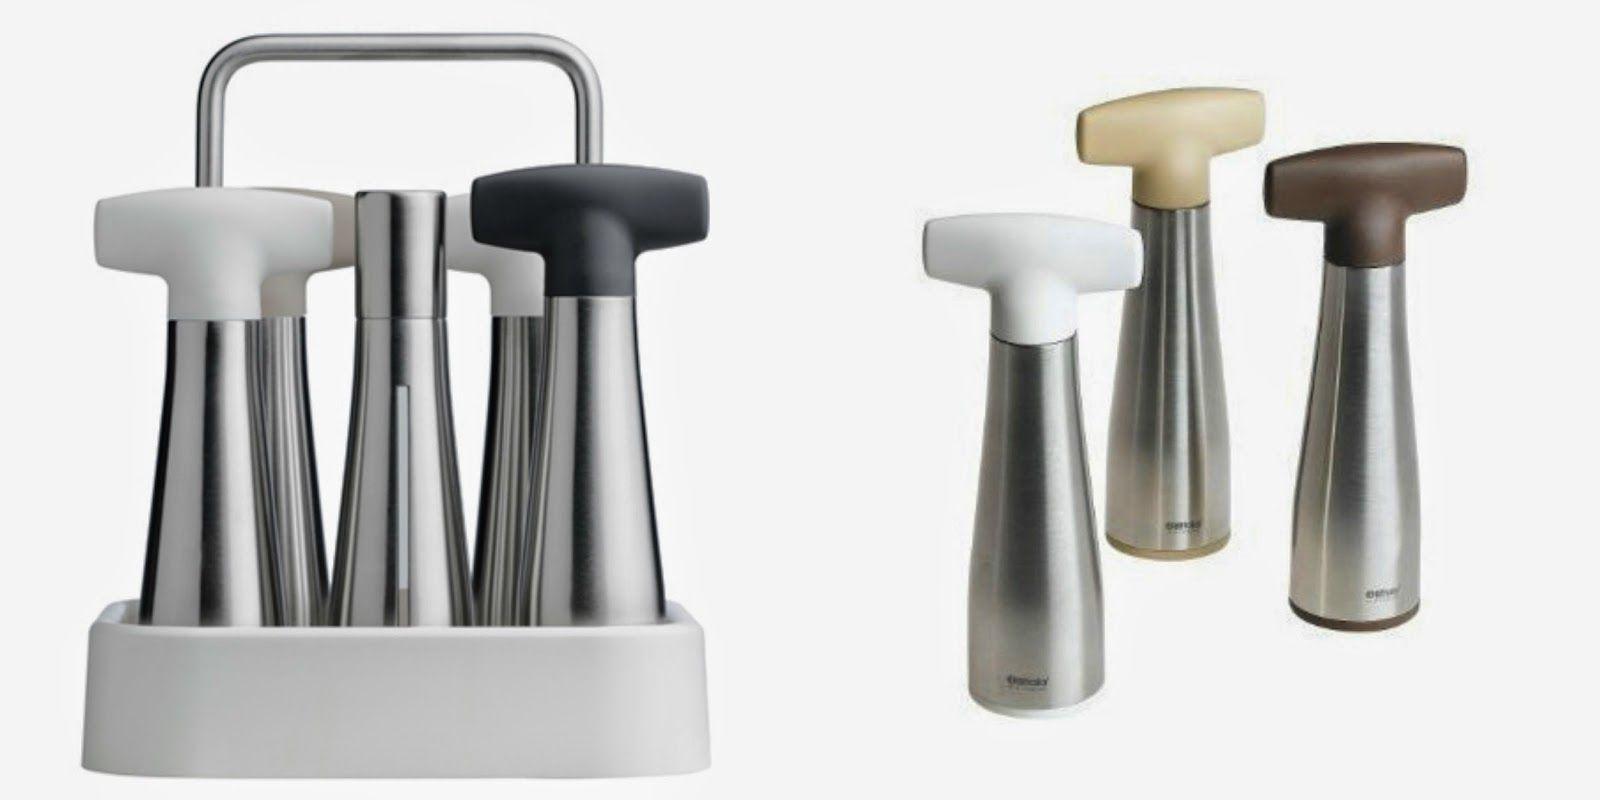 Collective Tools   designed by Antonio Citterio & Glen Oliver Löw. Iittala